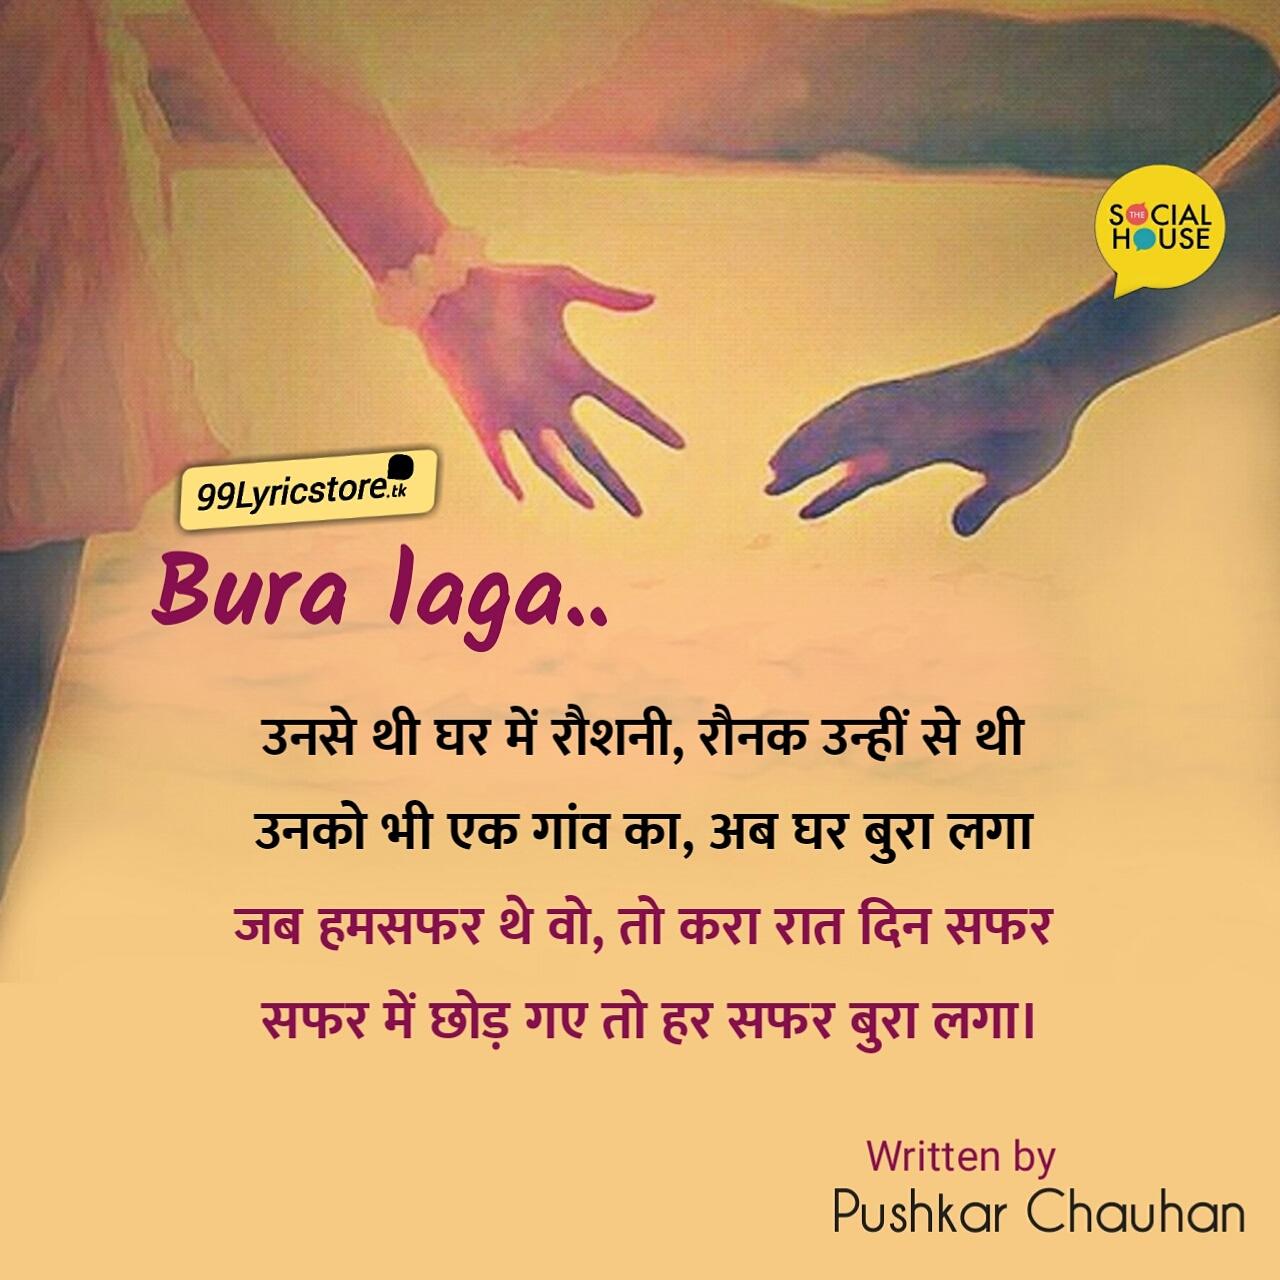 'Bura laga' is very beautiful Ghazal written and performed by Pushkar Chauhan on The Social House's Platform.